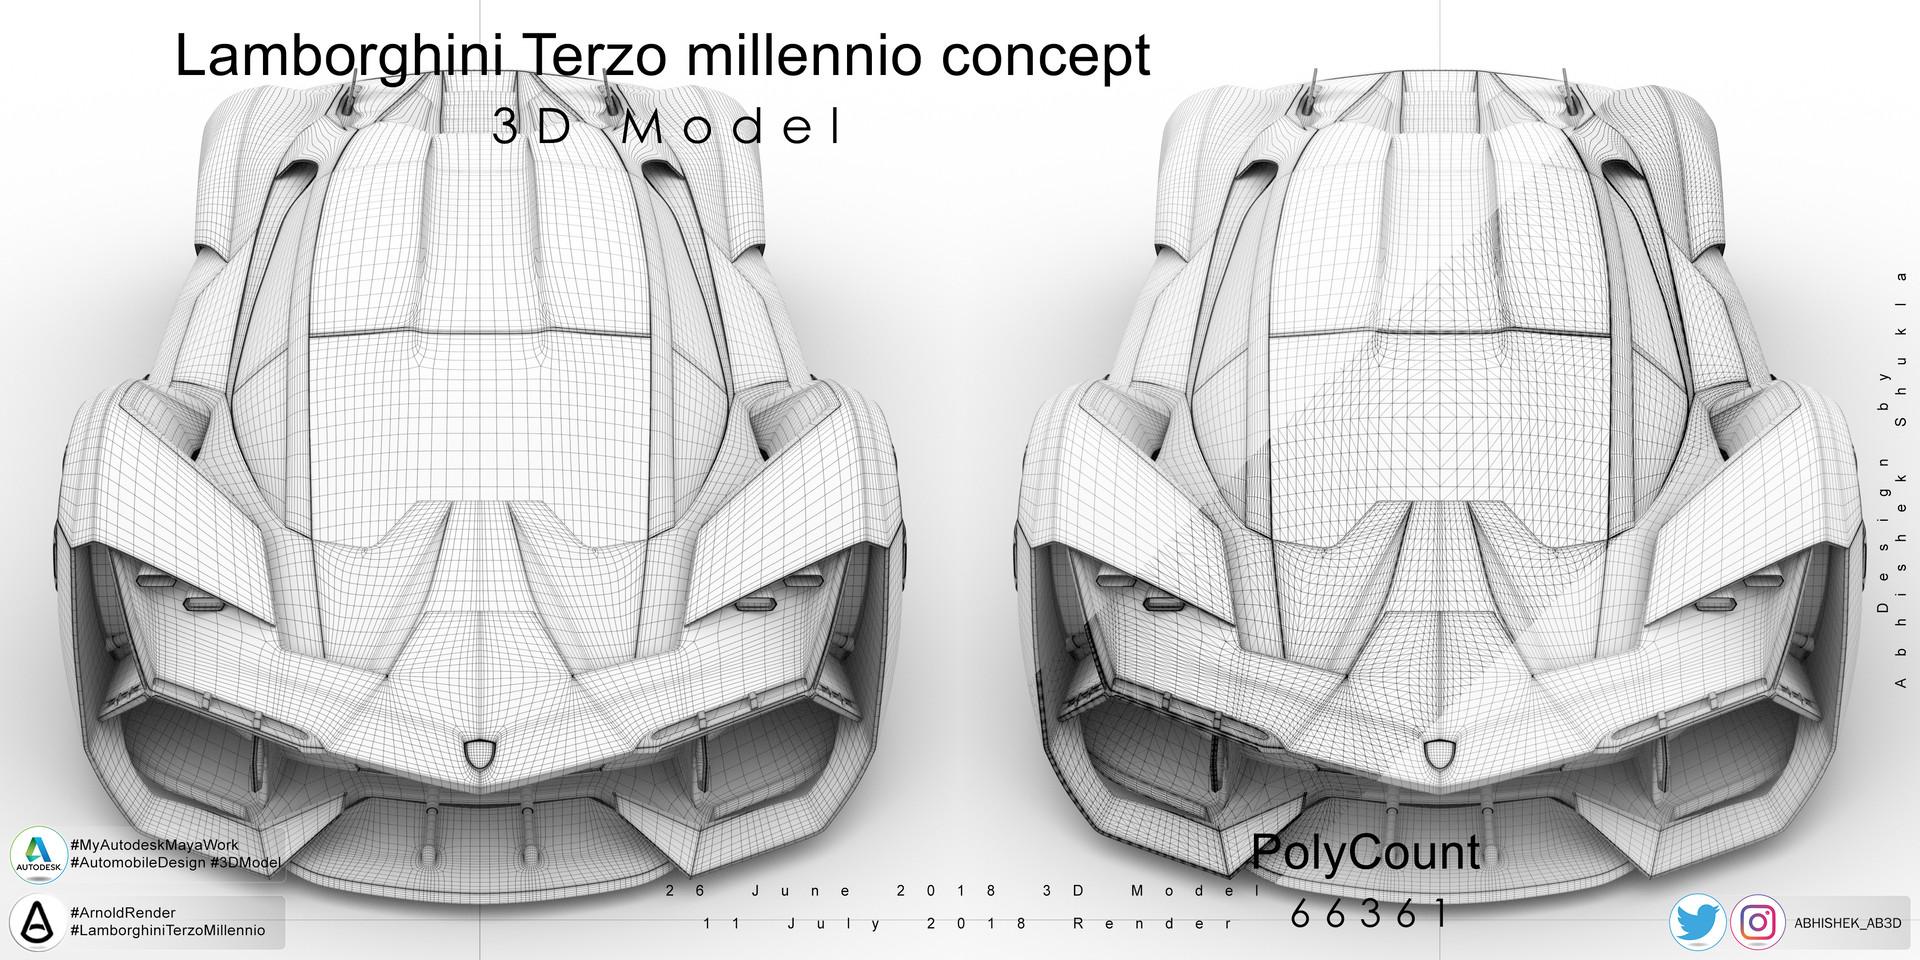 medium resolution of artstation lamborghini terzo millennio 3d model abhishek shukla car 3d diagram